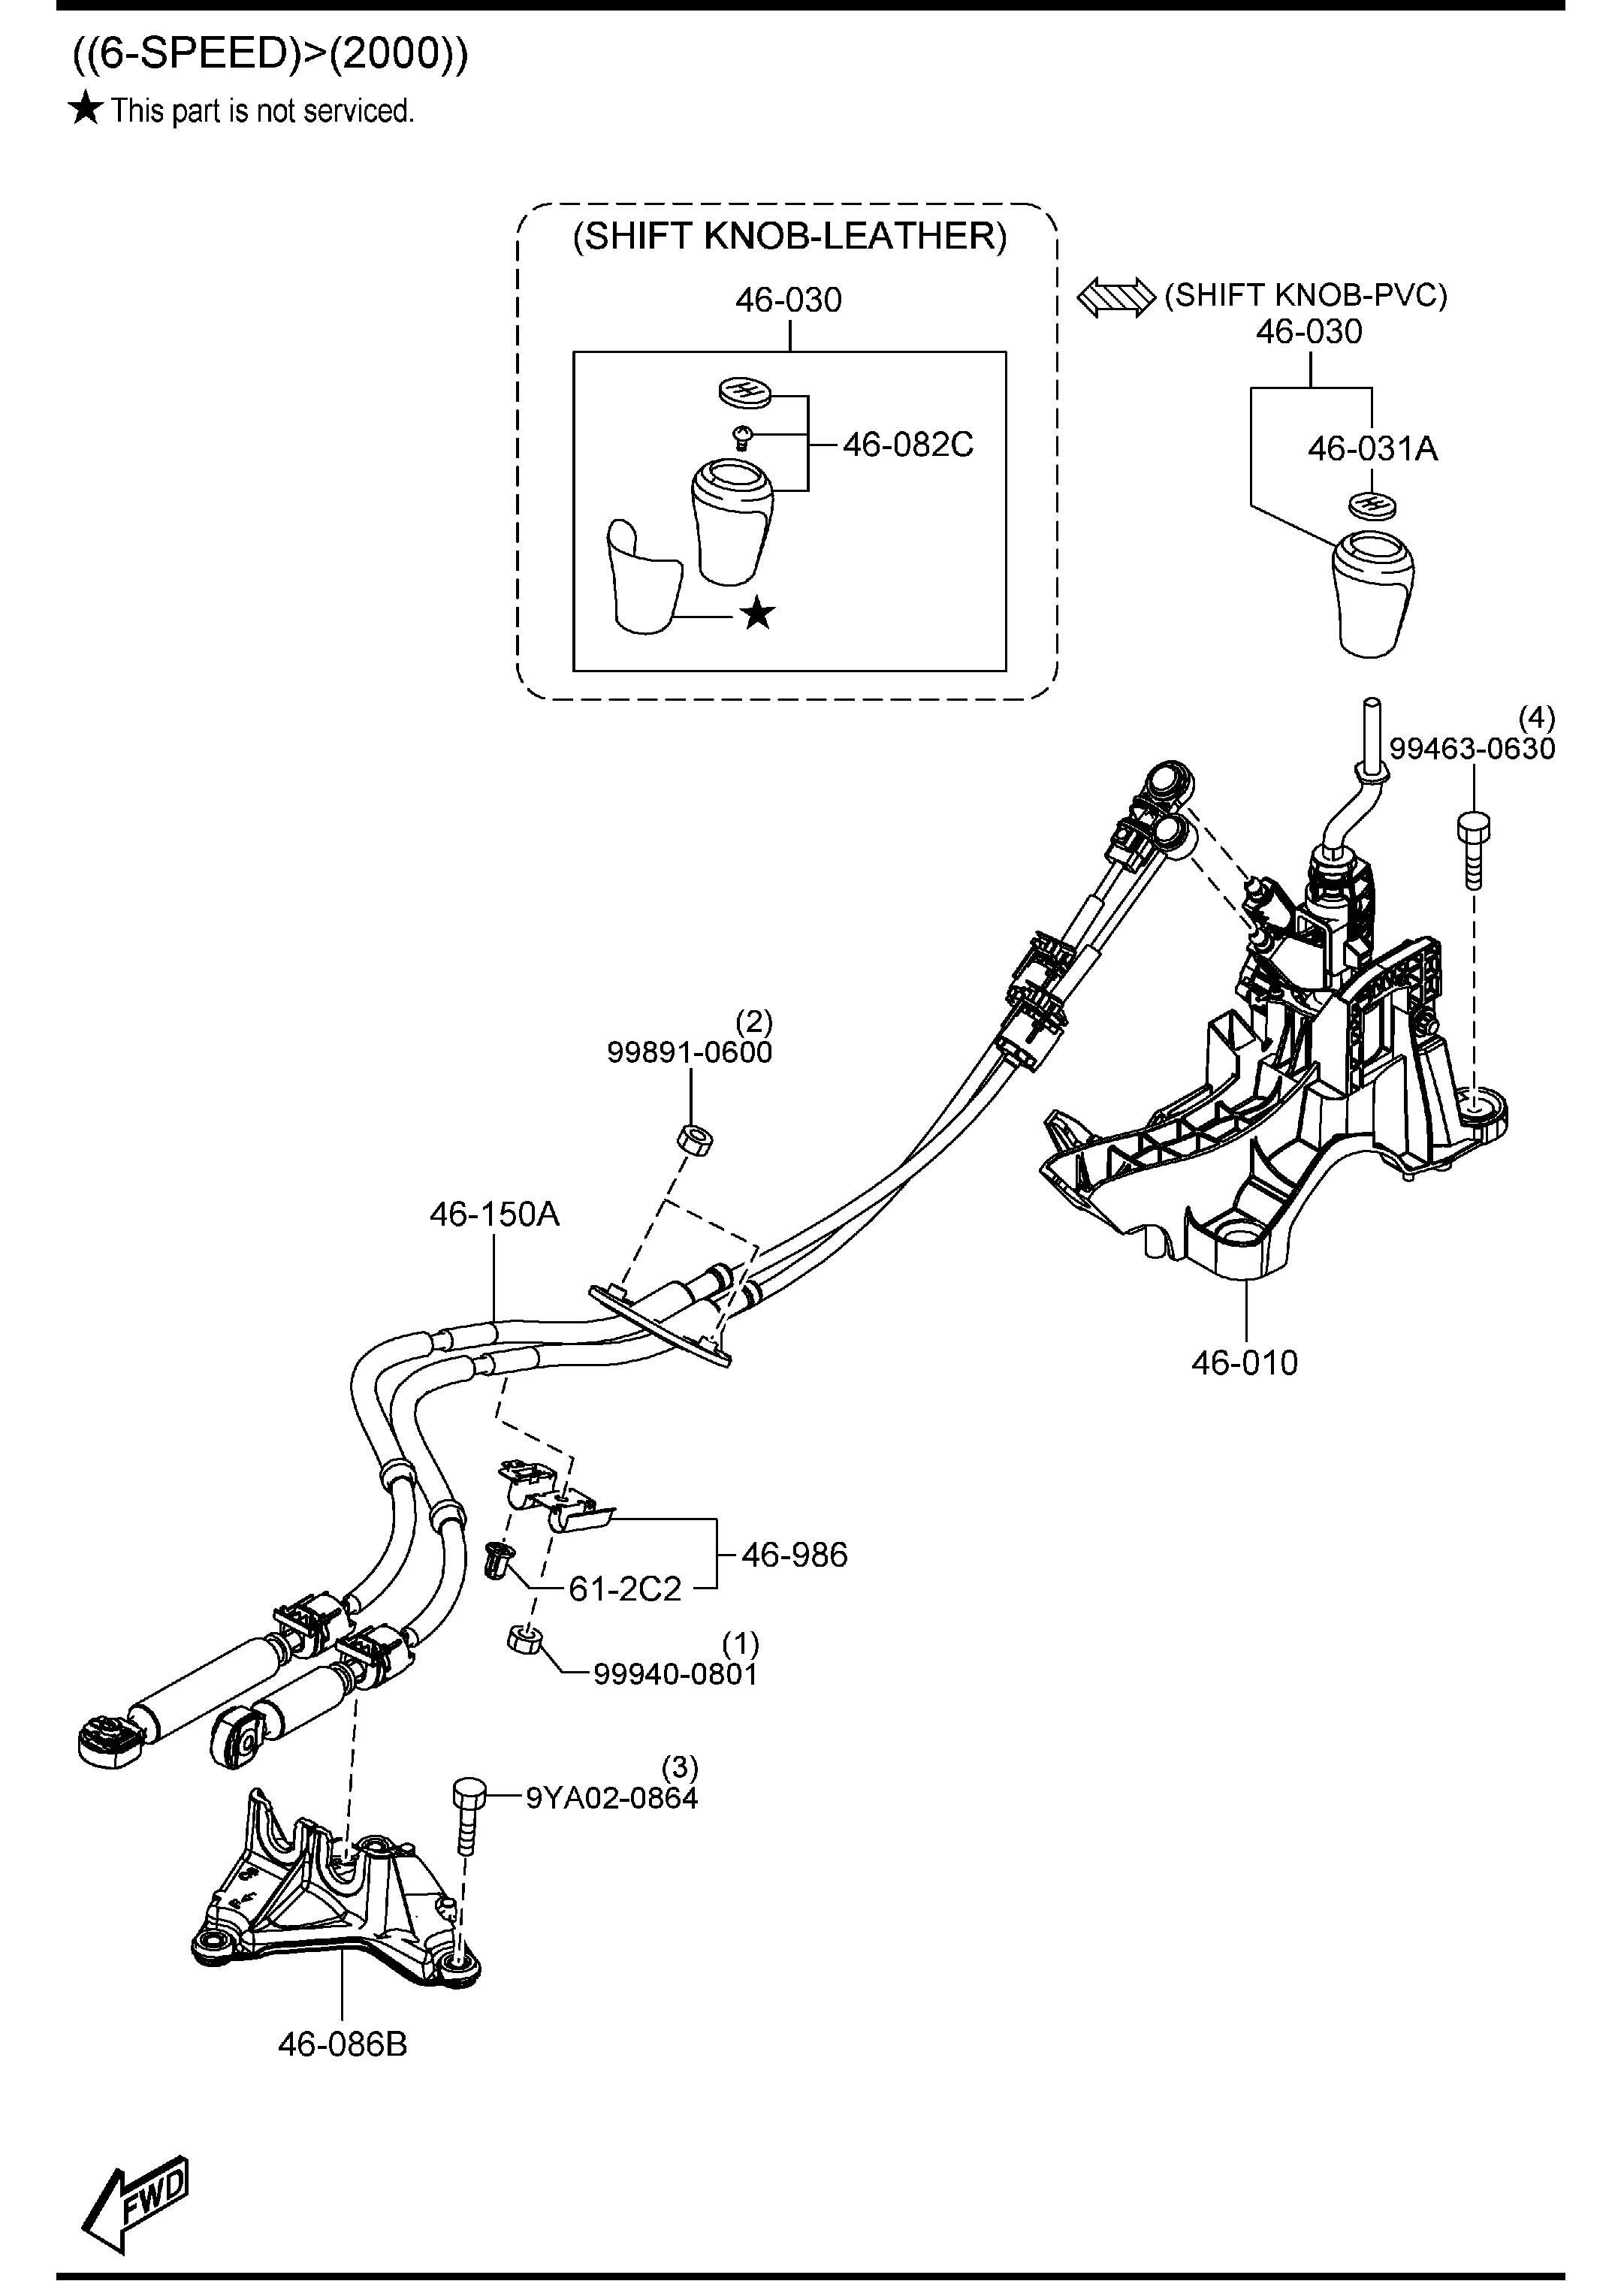 Mazda CHANGE CONTROL SYSTEM (MANUAL TRANSMISSION)